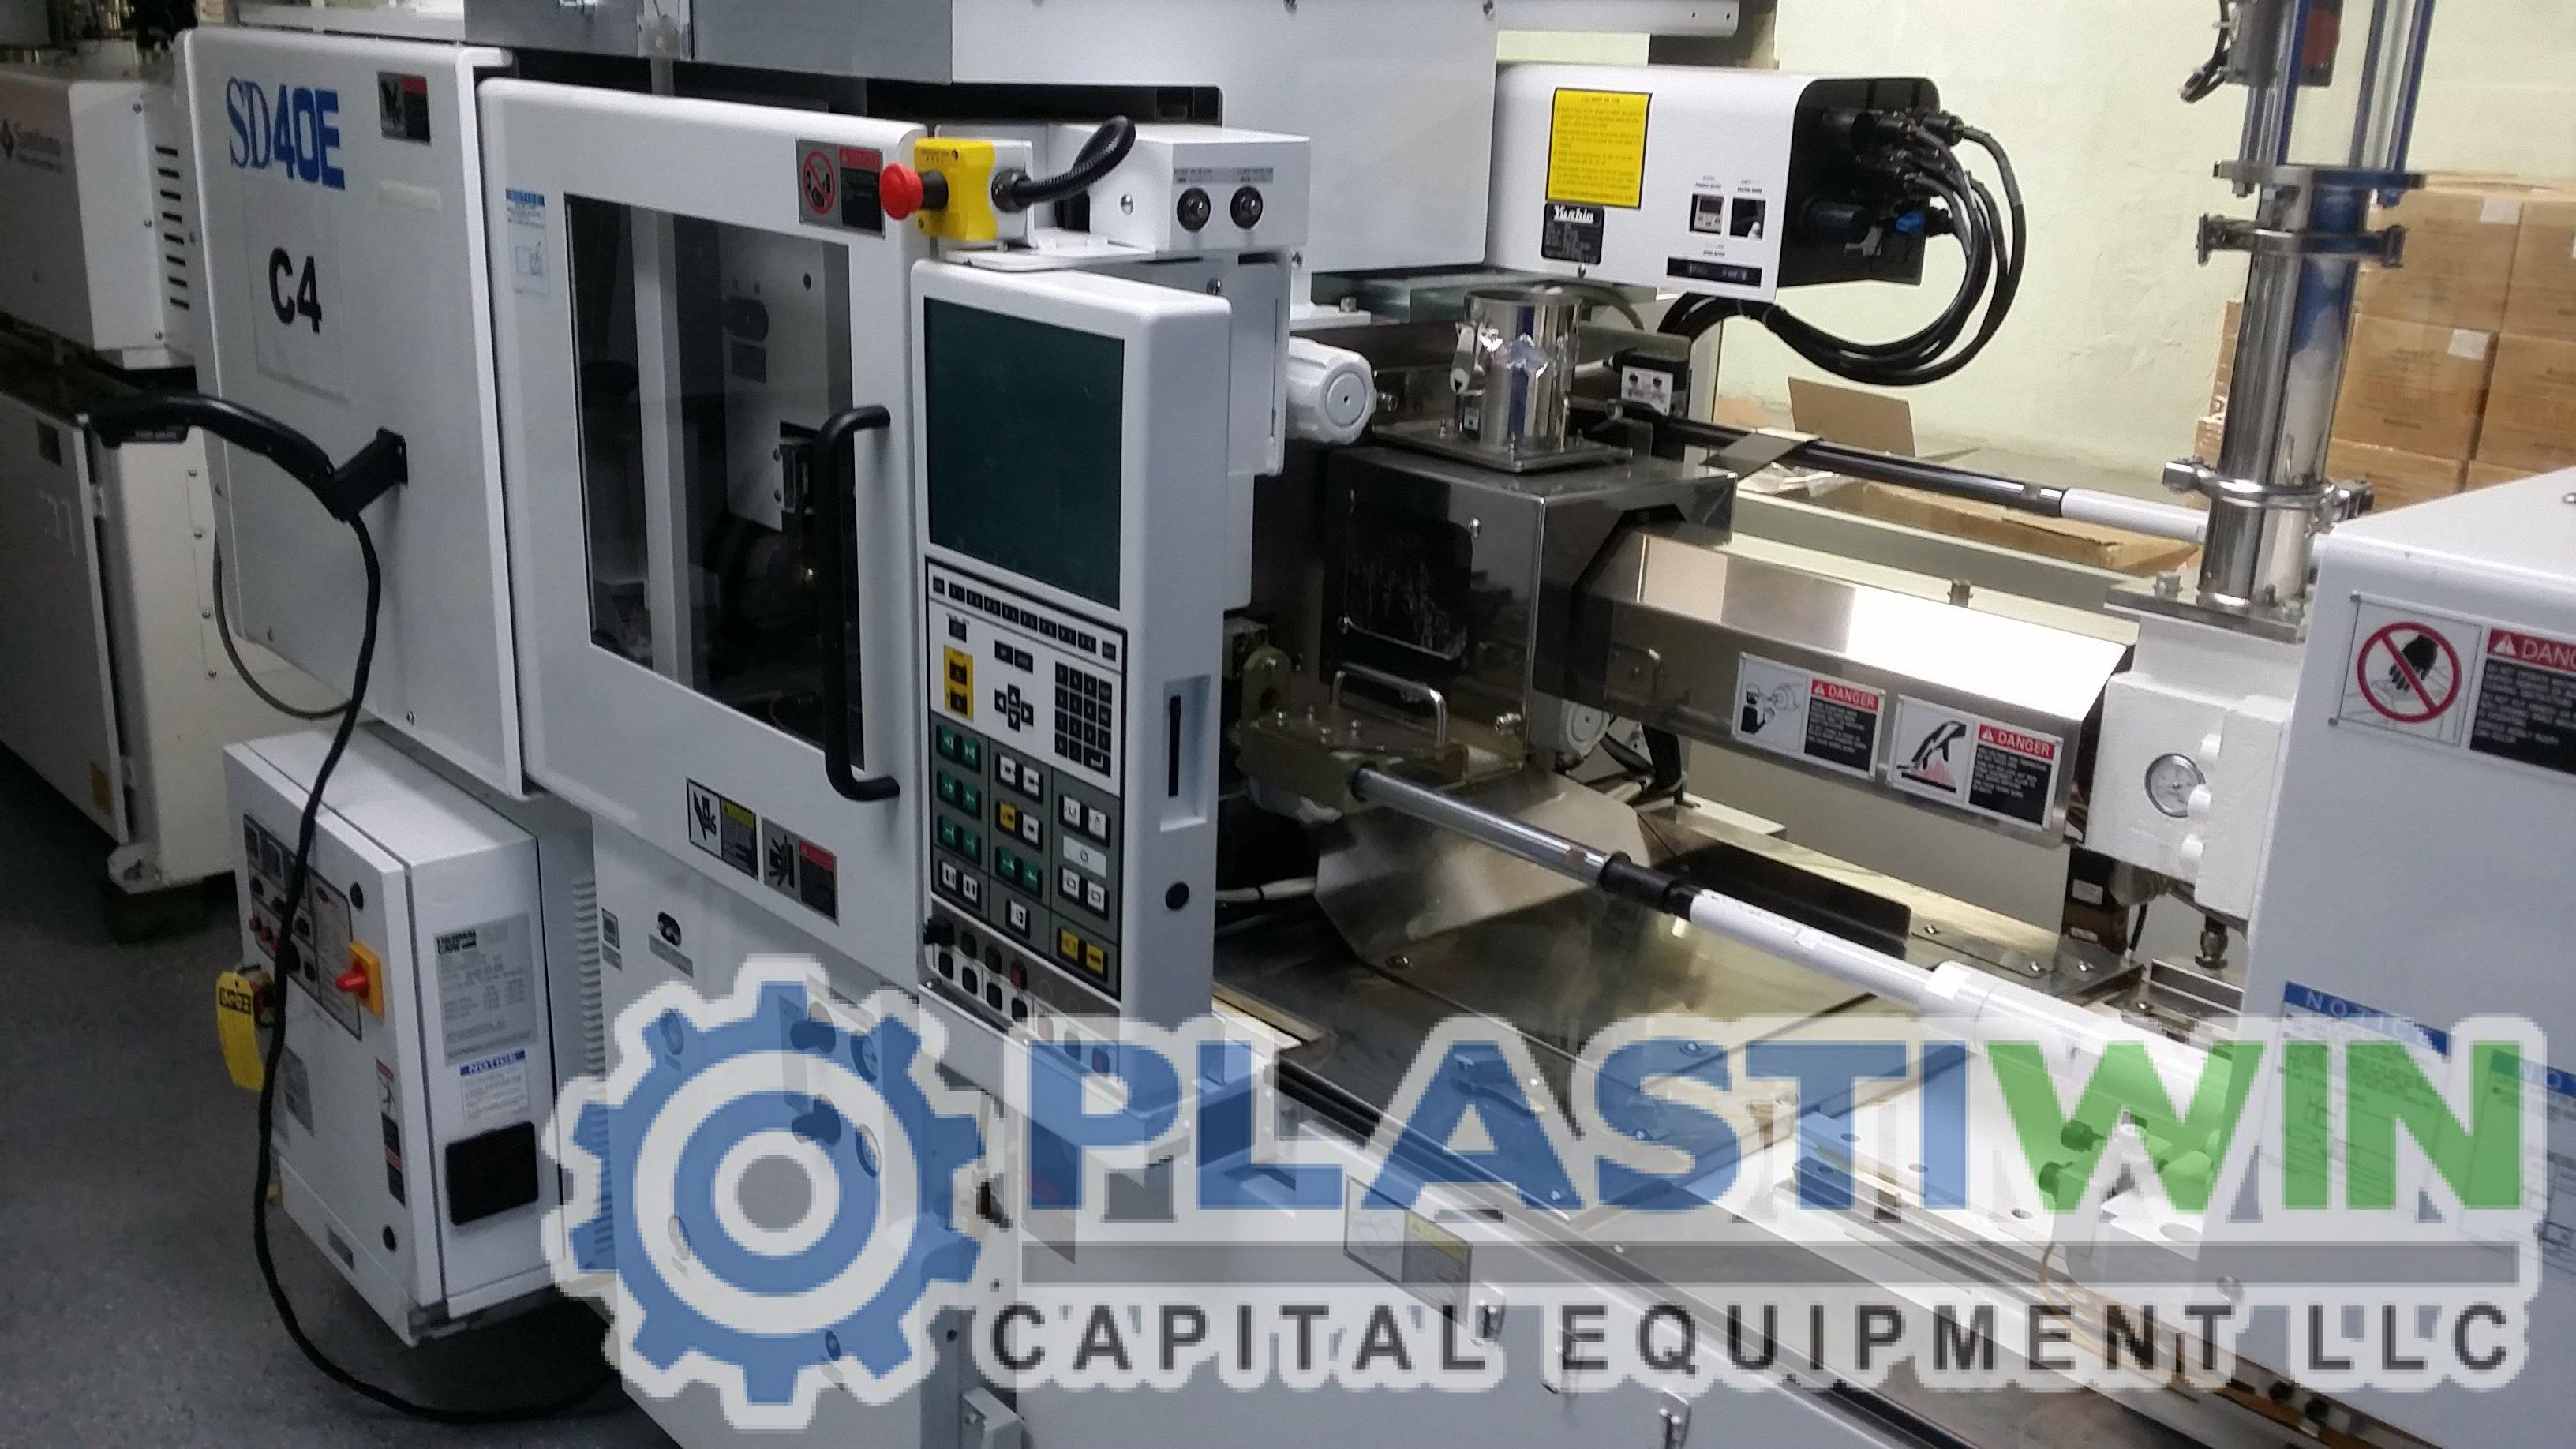 Sumitomo Injection Molding Machine Plastiwin Capital